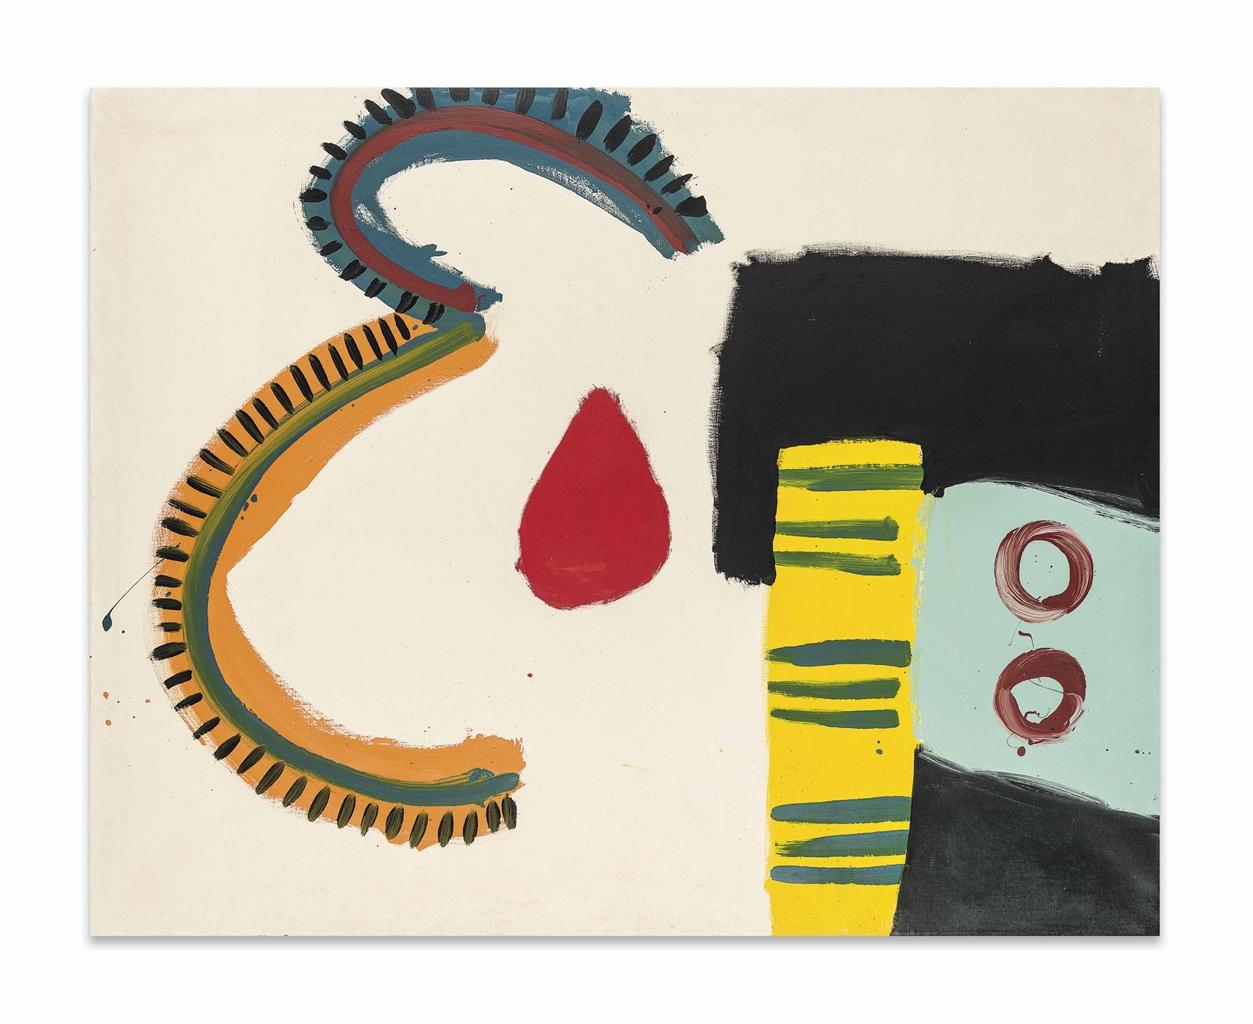 Alan Davie-Parrot grip No. 5-1960